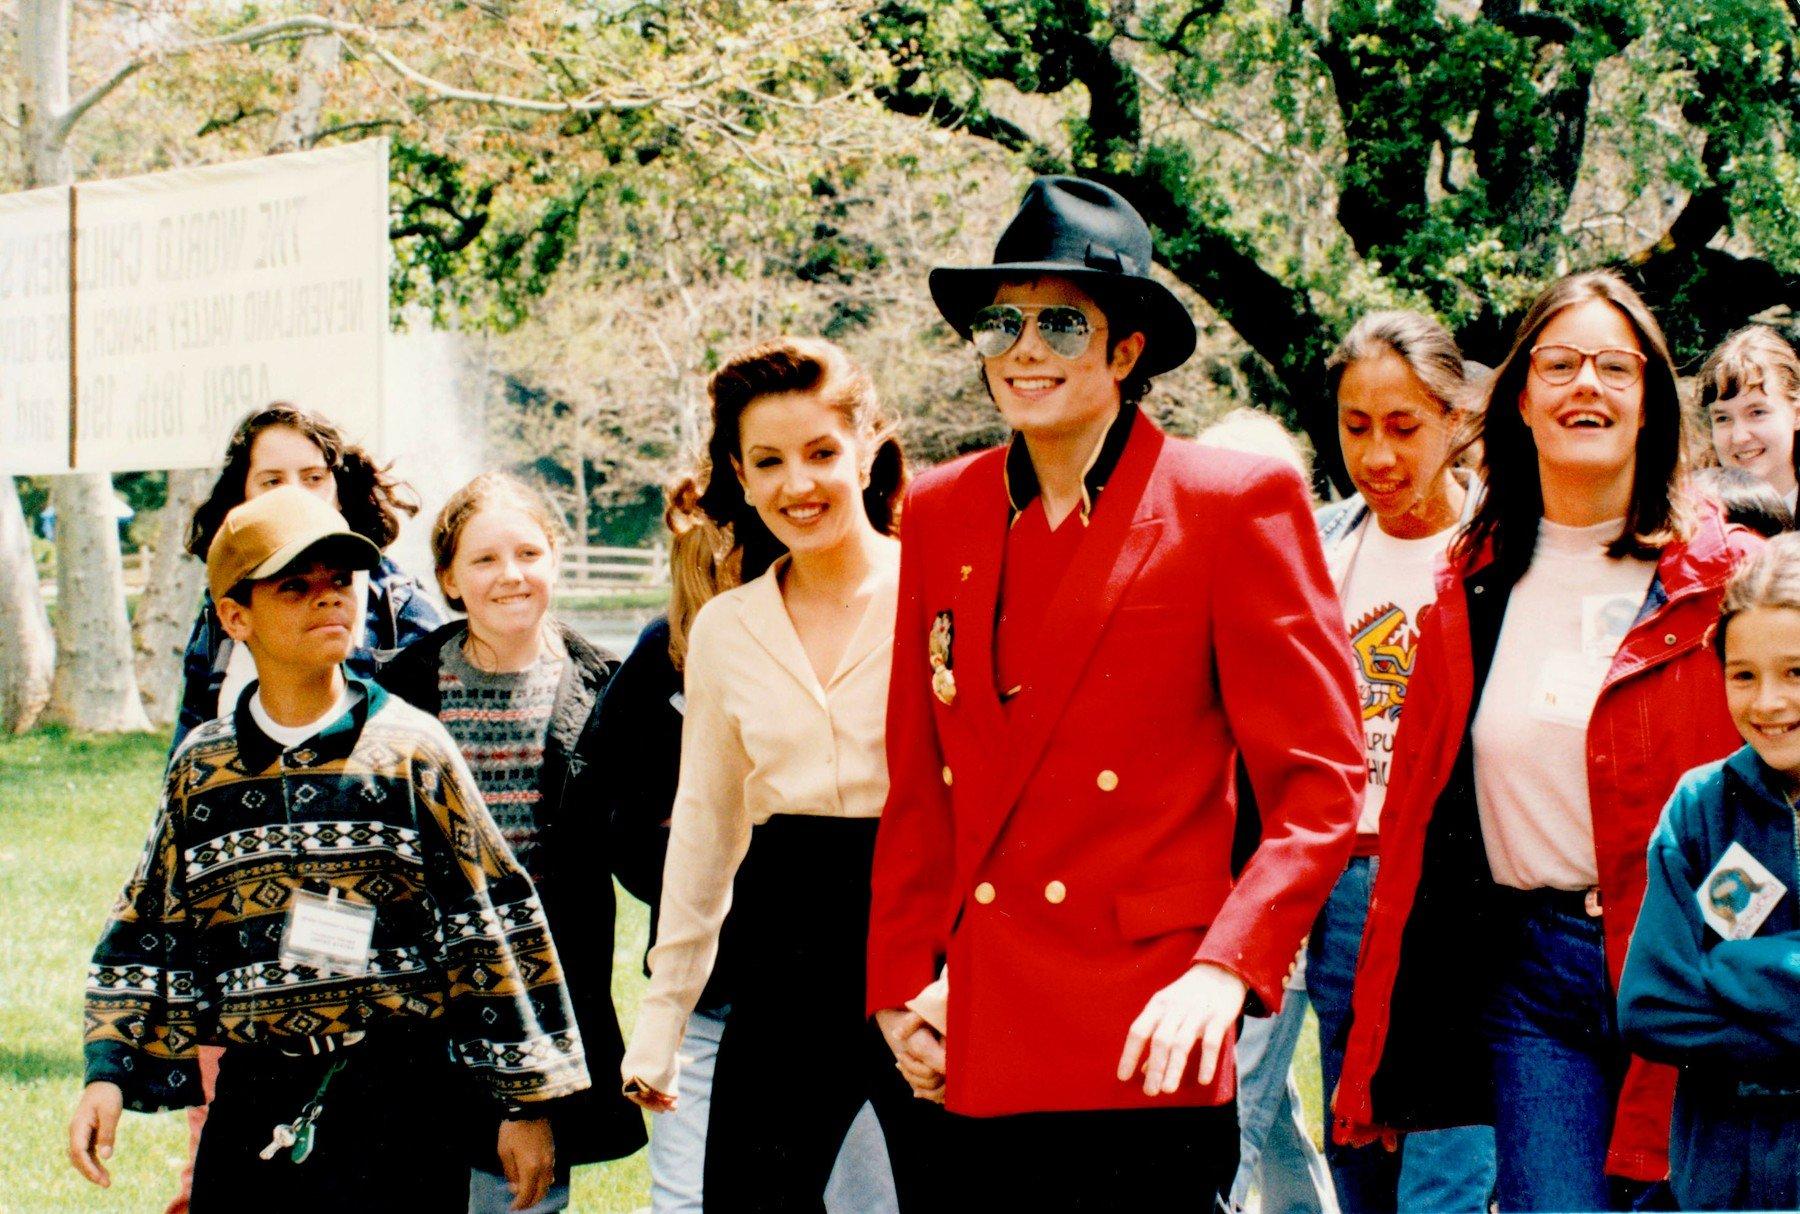 Lisa Marie Presley i Michael Jackson 1995. godine